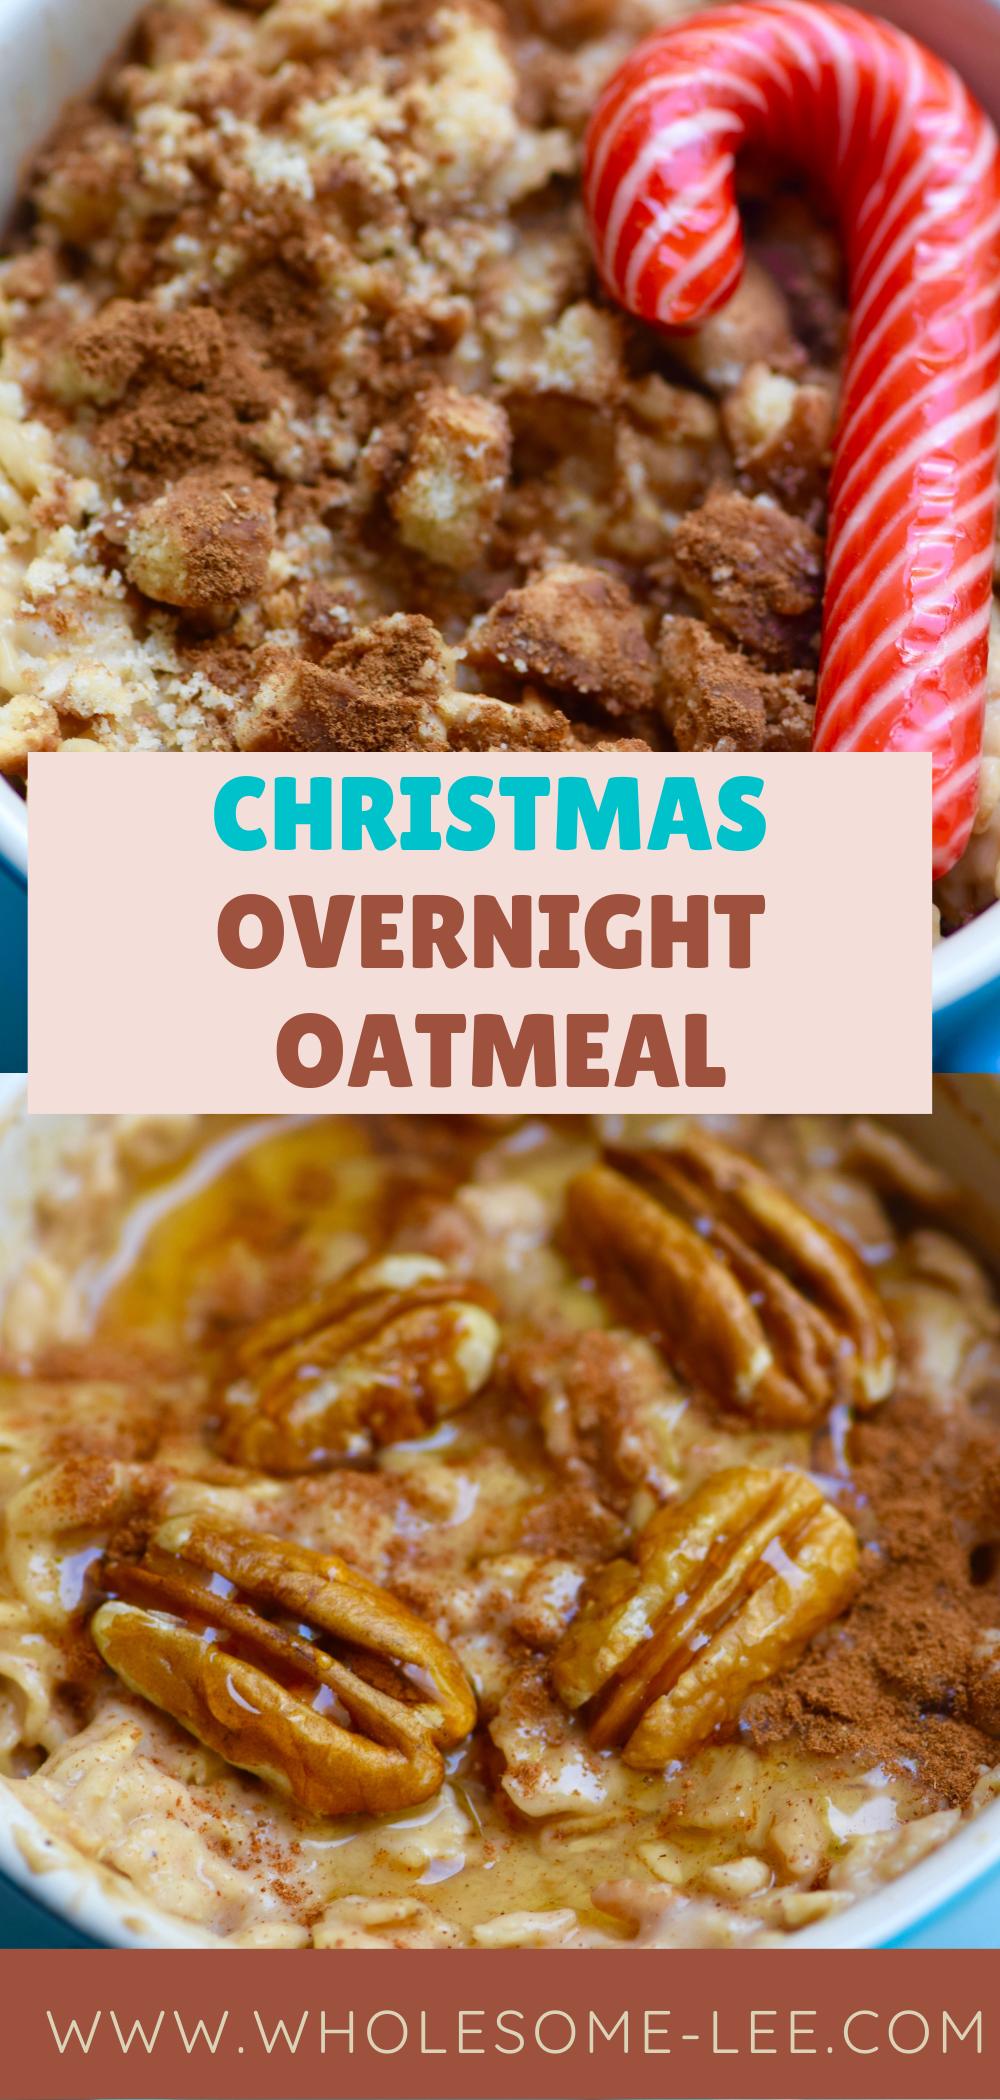 Christmas overnight oatmeal